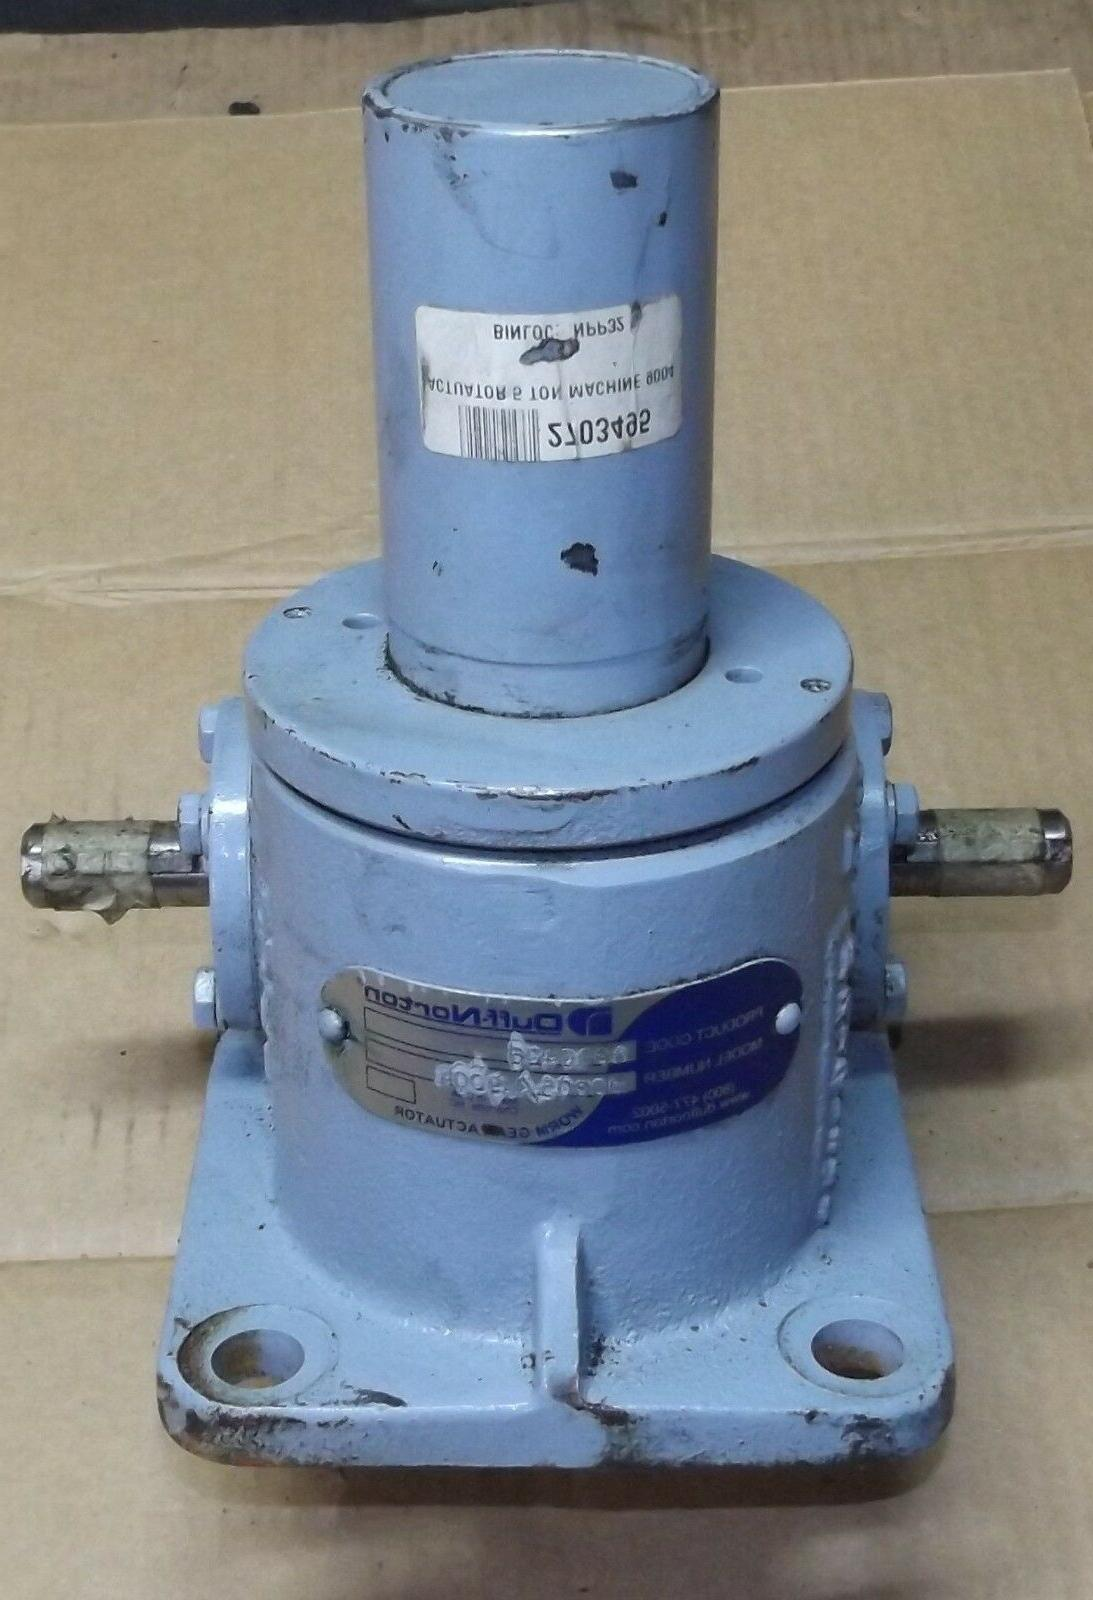 duff norton mechanical worm gear screw actuator